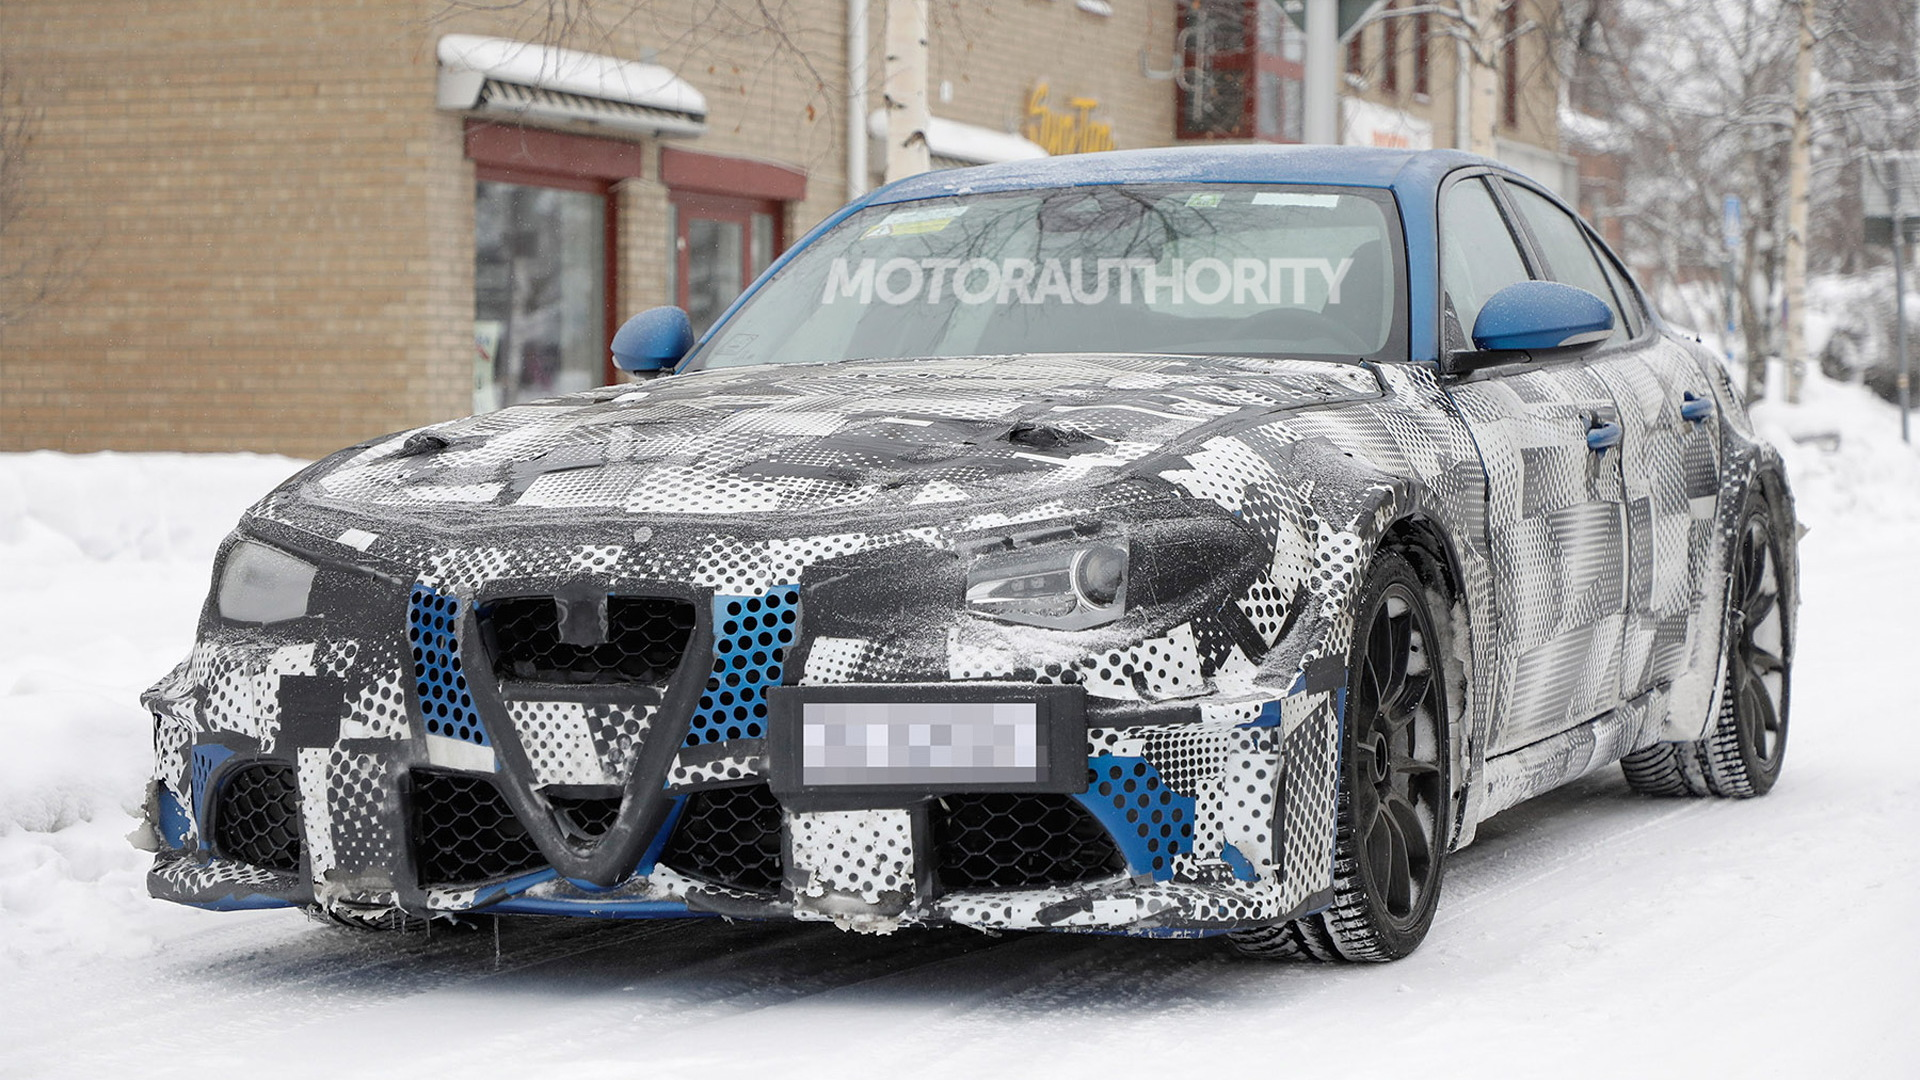 2023 Maserati GranTurismo test mule spy shots - Photo credit:S. Baldauf/SB-Medien